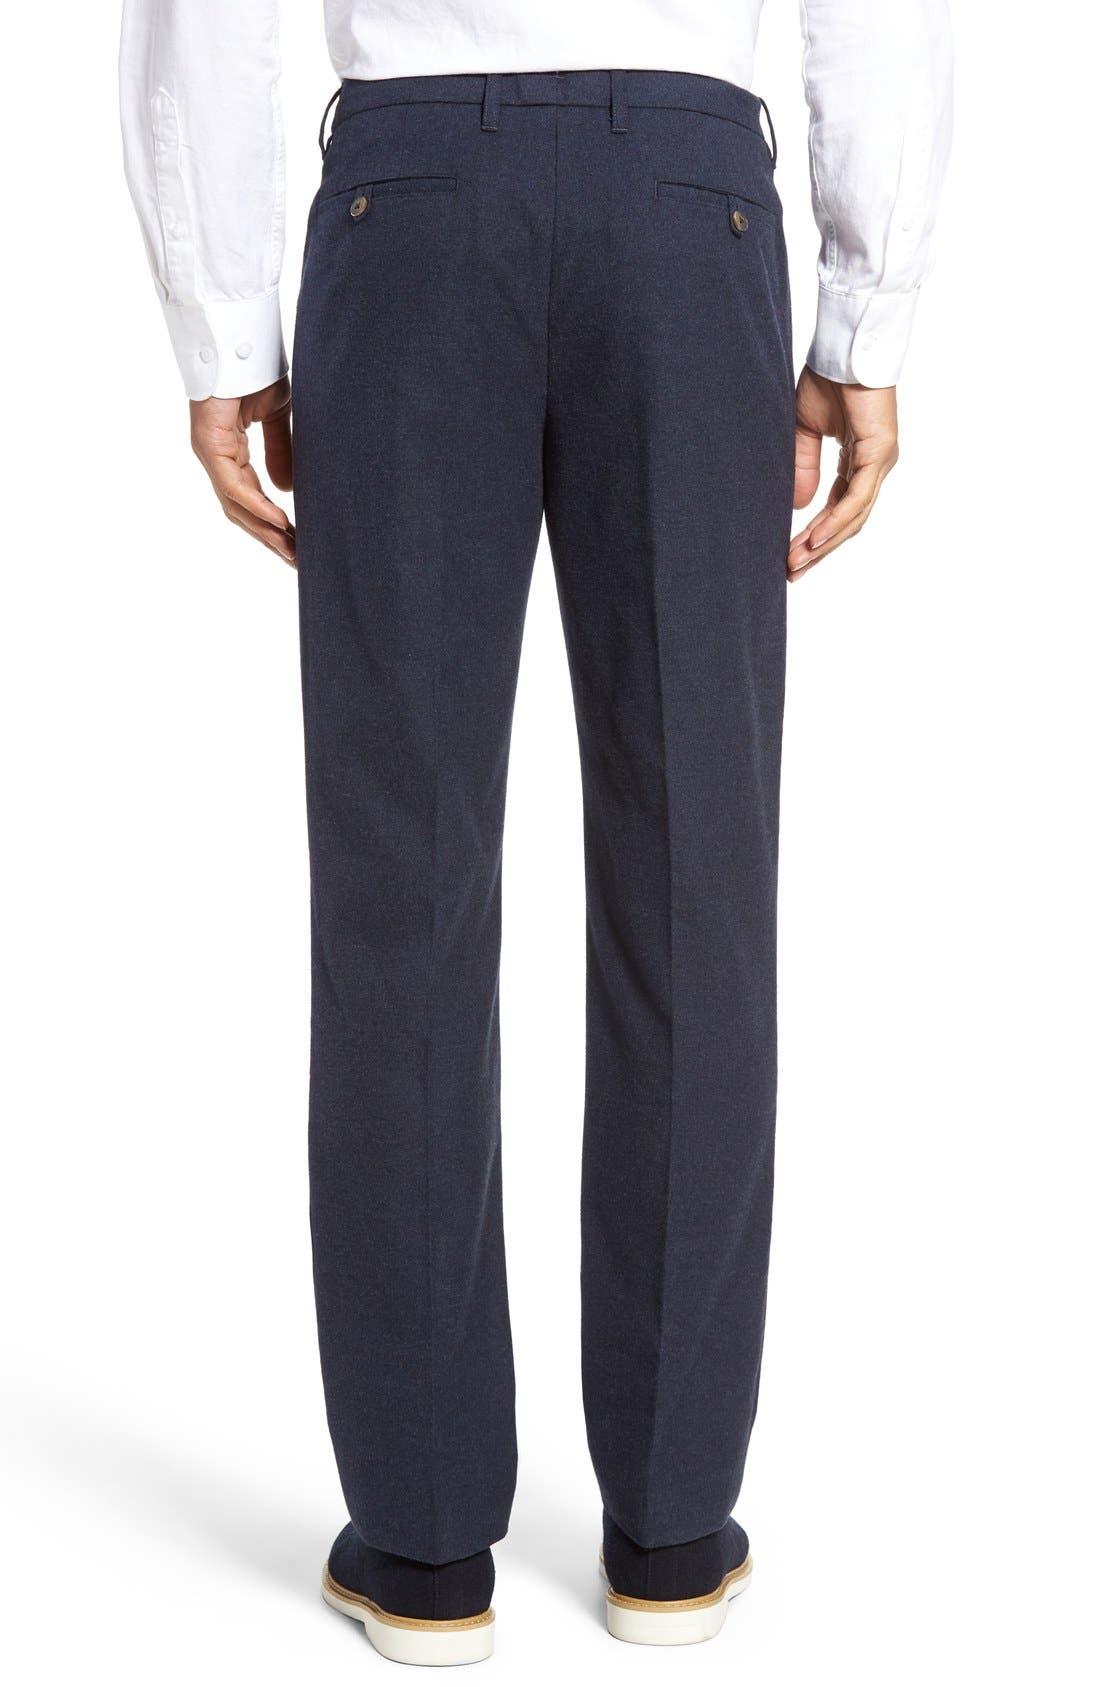 BONOBOS,                             Slim Fit Flannel Trousers,                             Alternate thumbnail 10, color,                             400